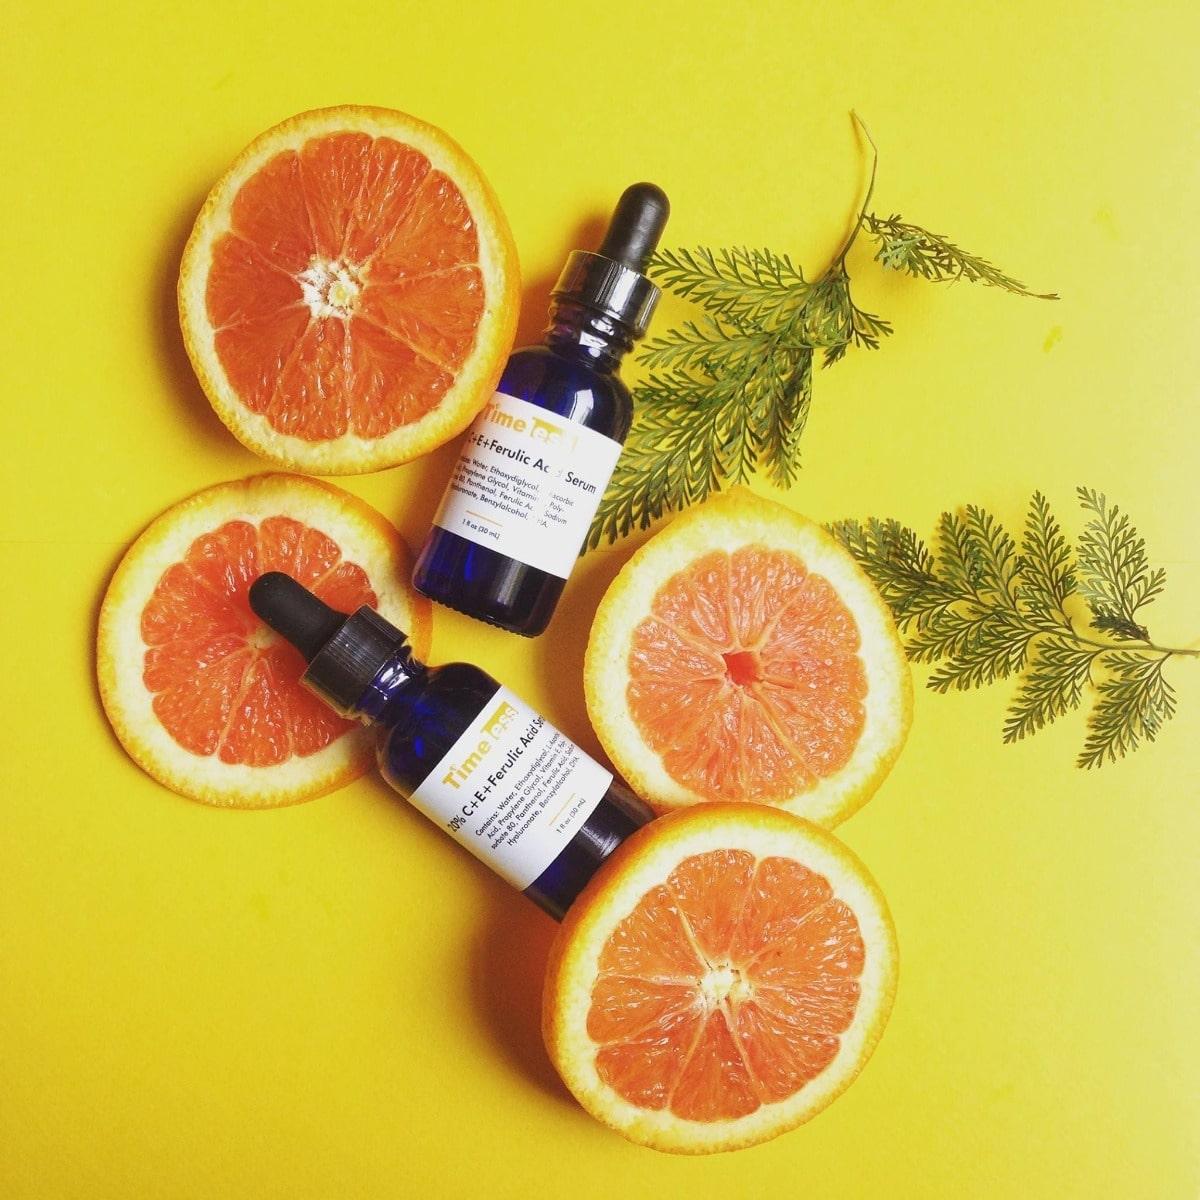 Timeless vitamin C và E